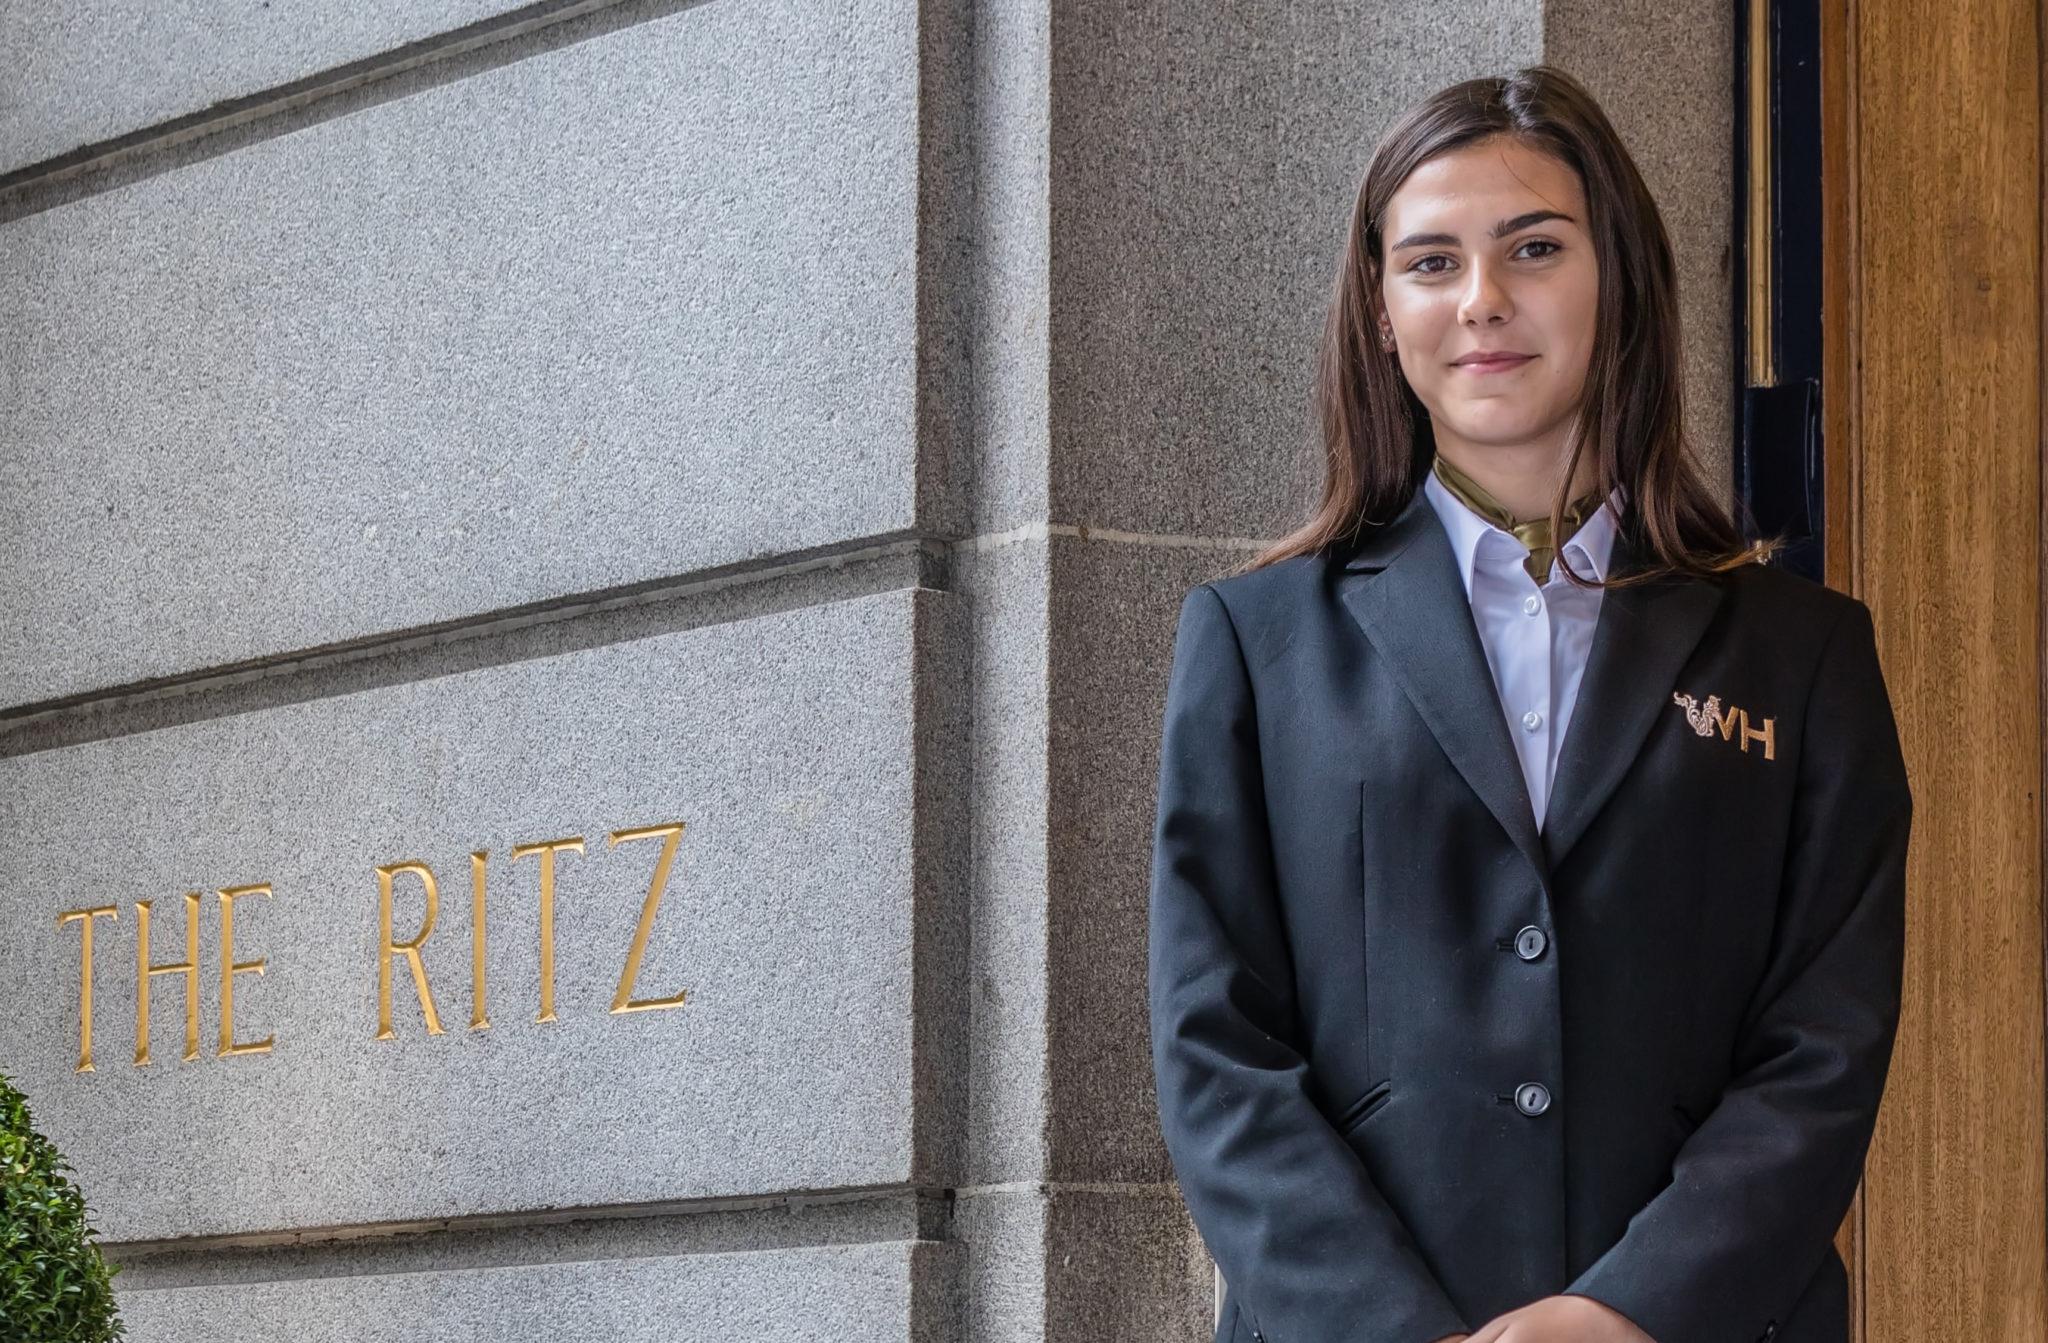 Jeri-Leigh Challen at The Ritz London